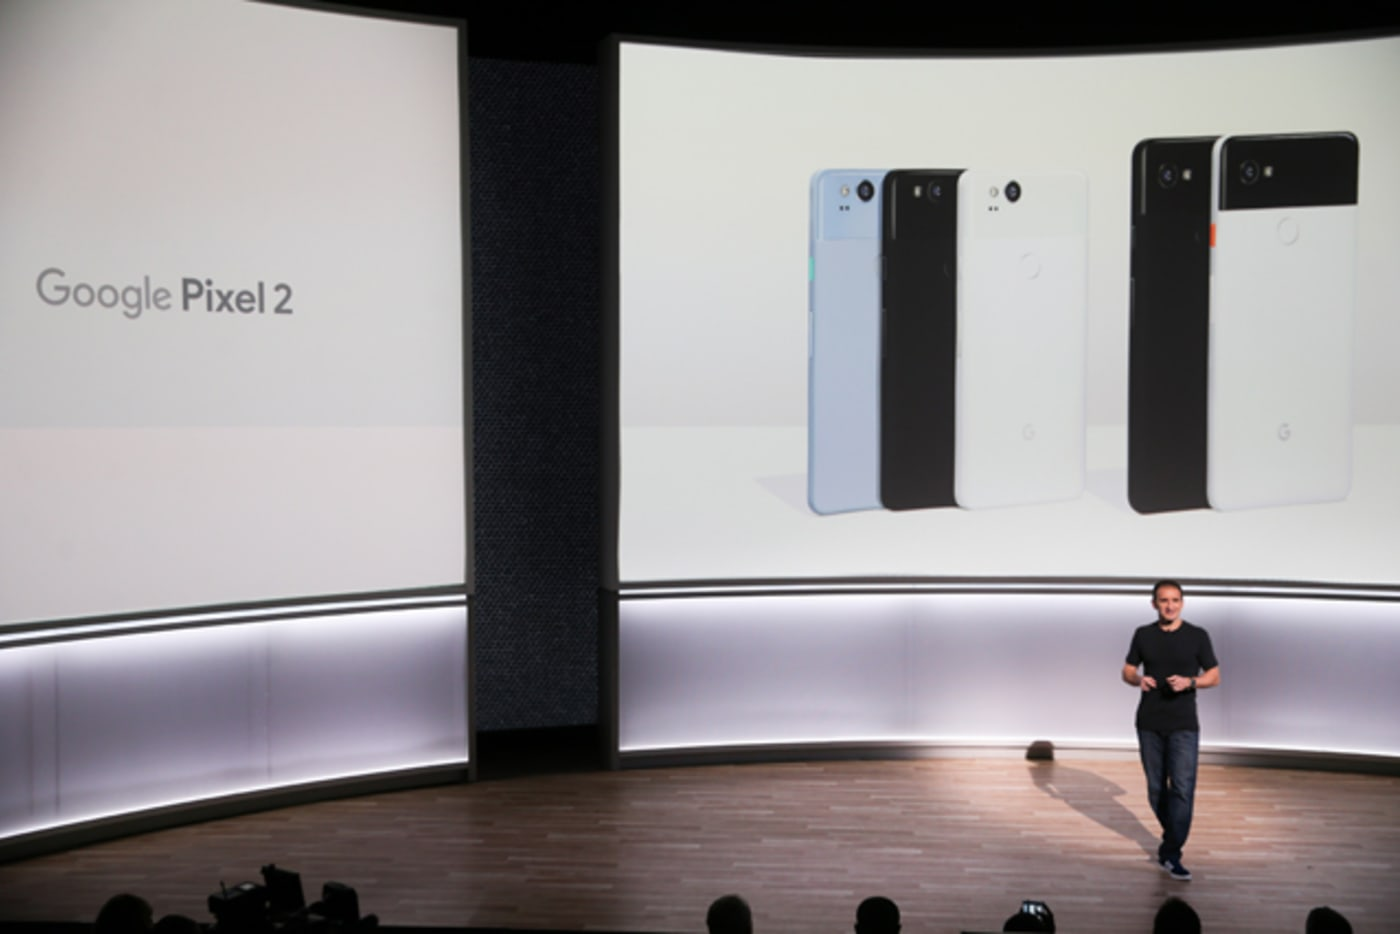 Google Pixel 2 announced